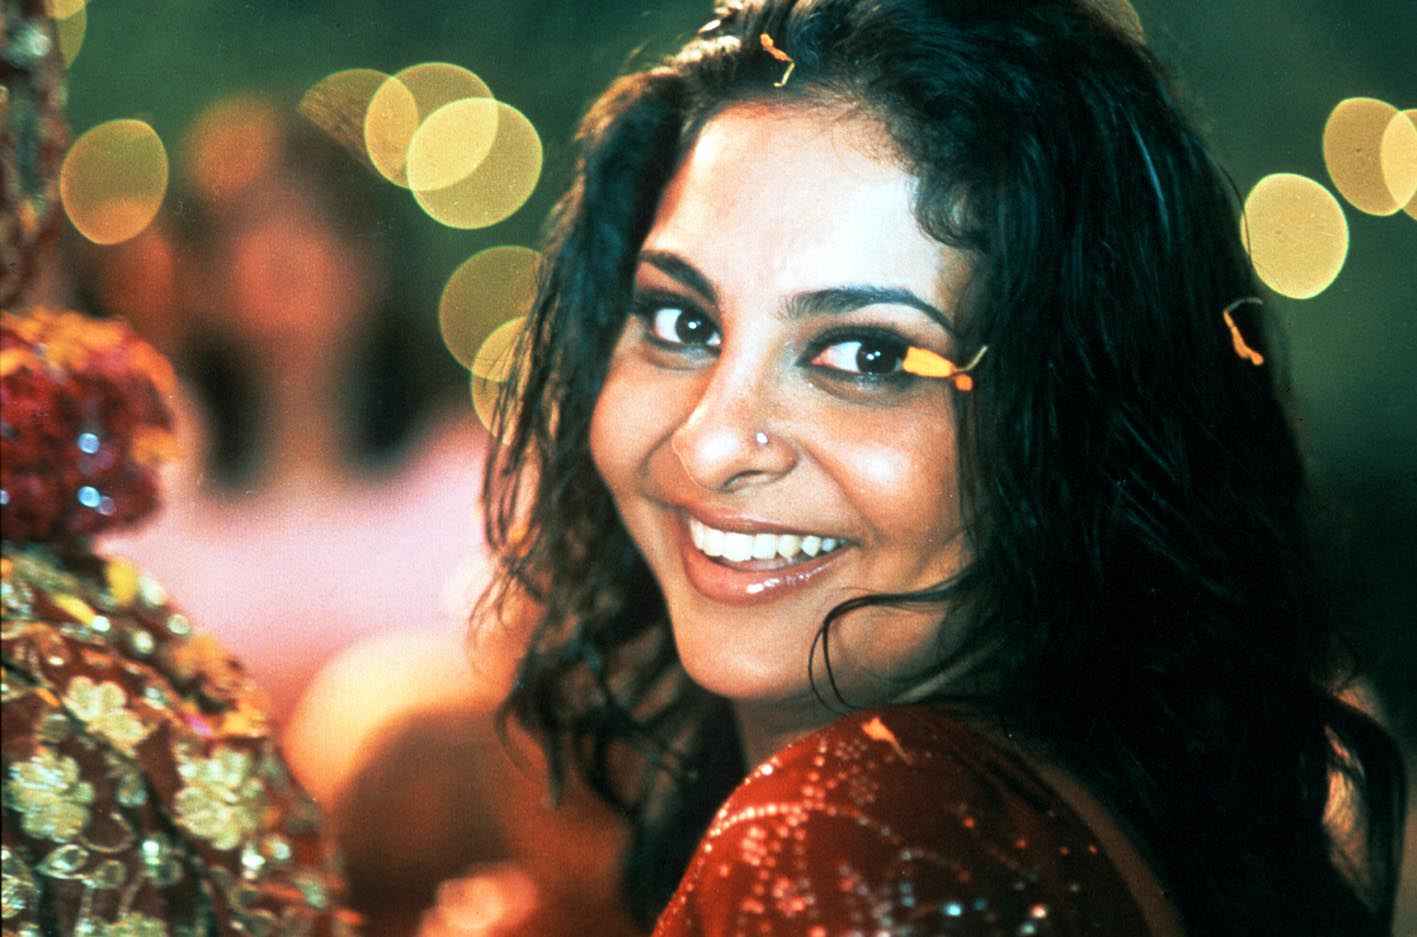 sedgwick hindu personals Cerita hantu malaysia full movie full hd video downloads.